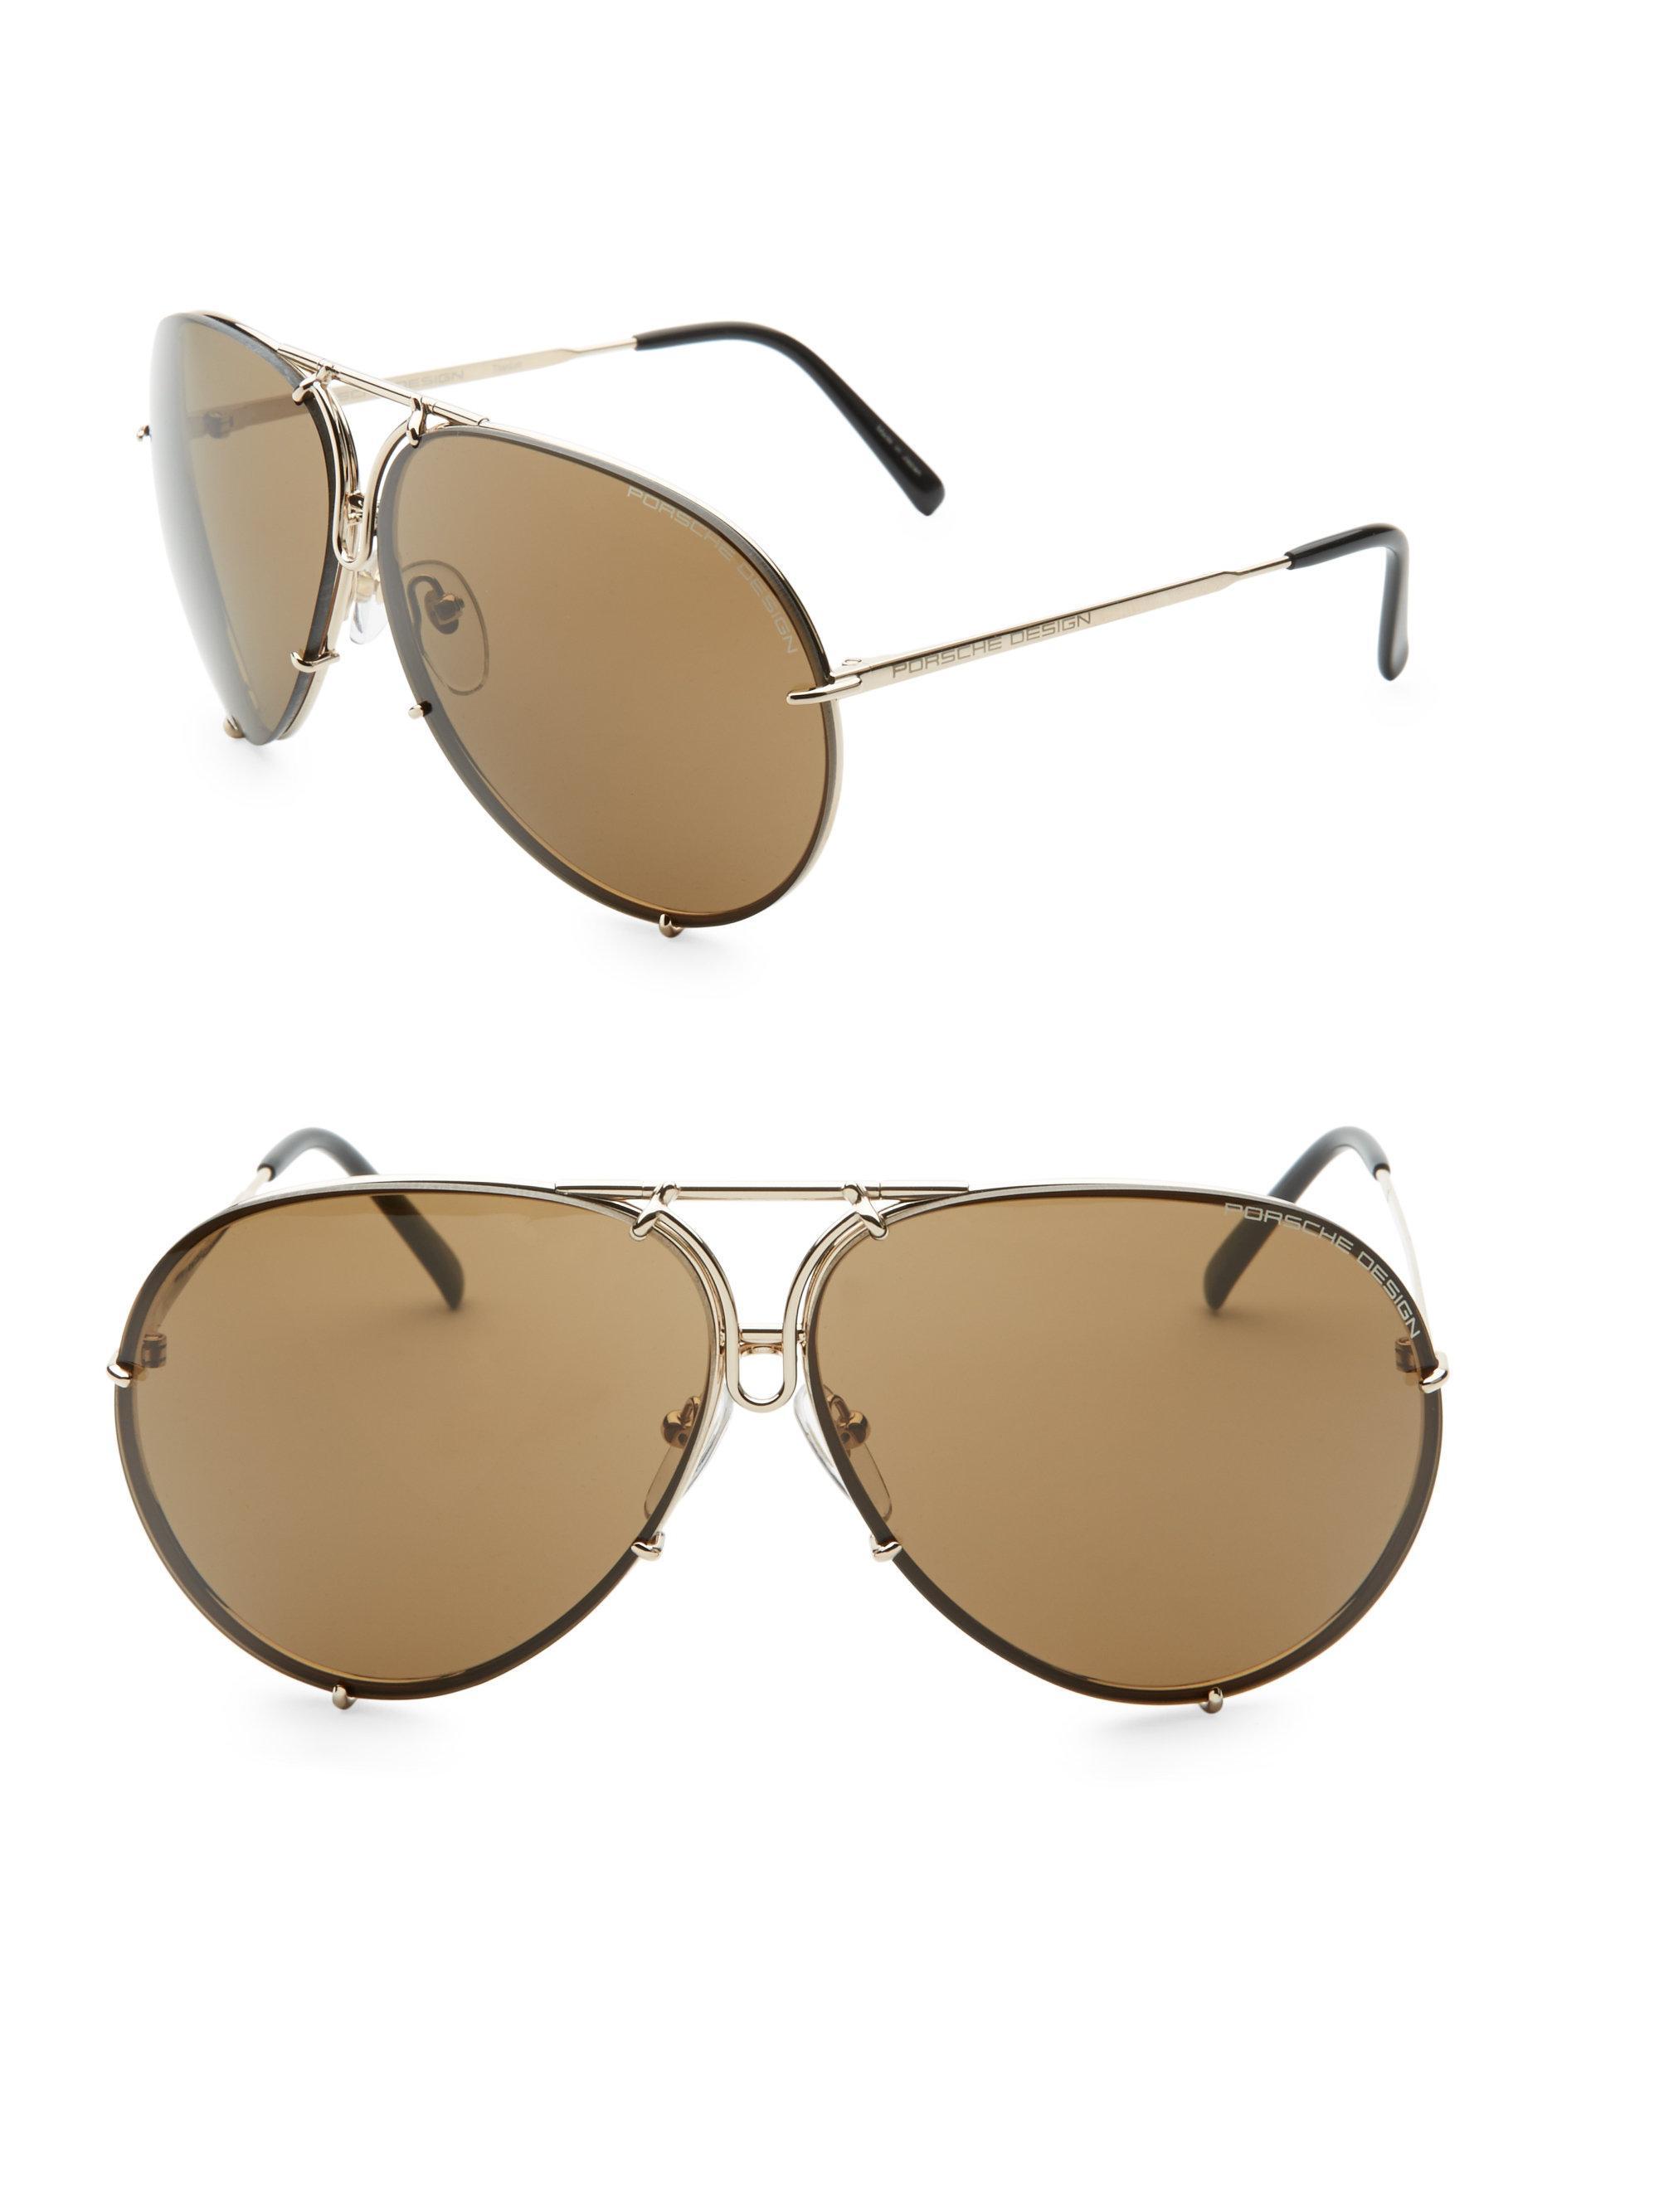 78001eb458c Porsche Design Aviator Sunglasses - Restaurant and Palinka Bar